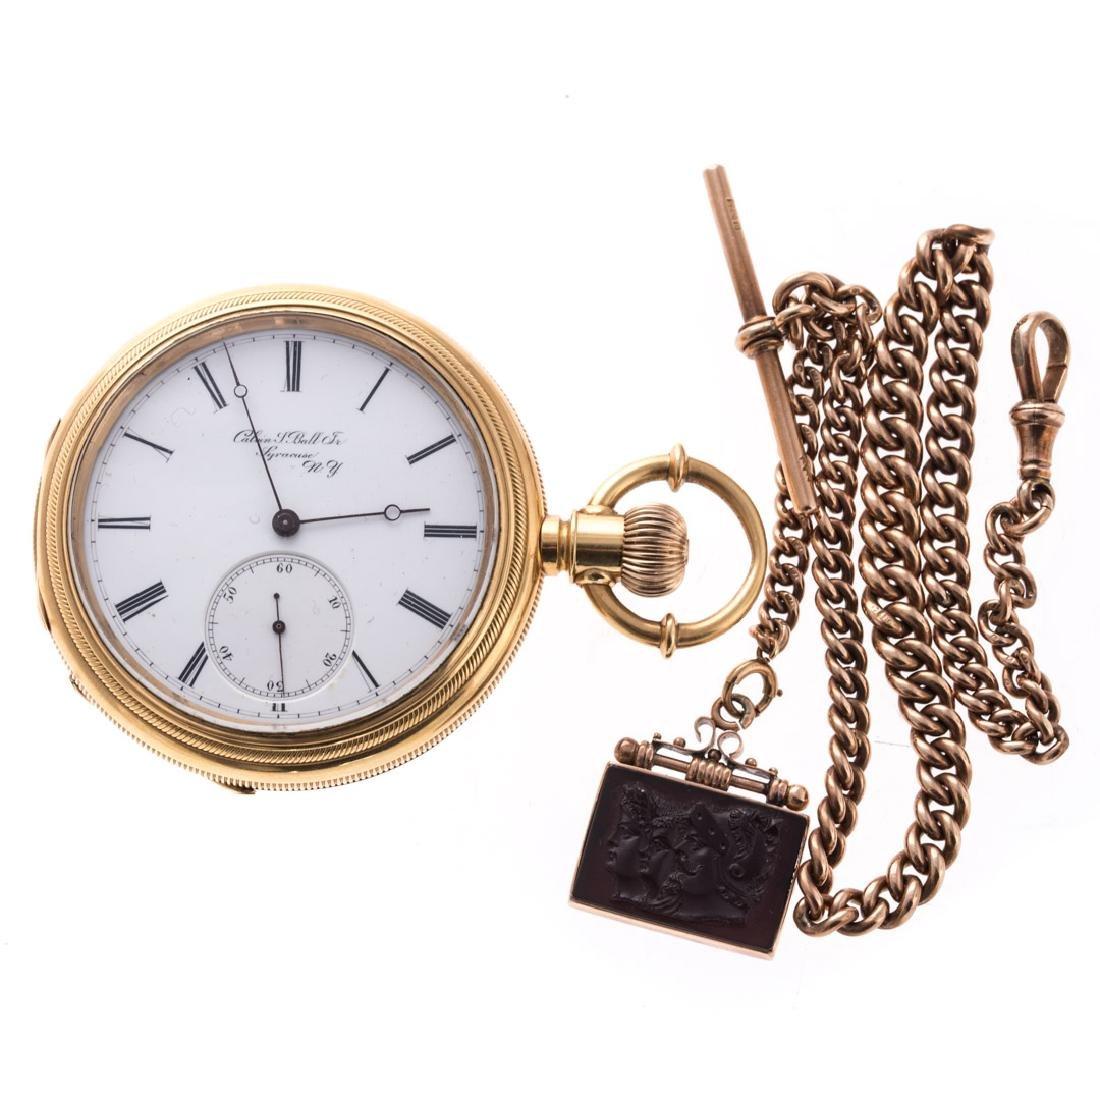 A Calvin Ball Pocket Watch in 18K & 9K Chain